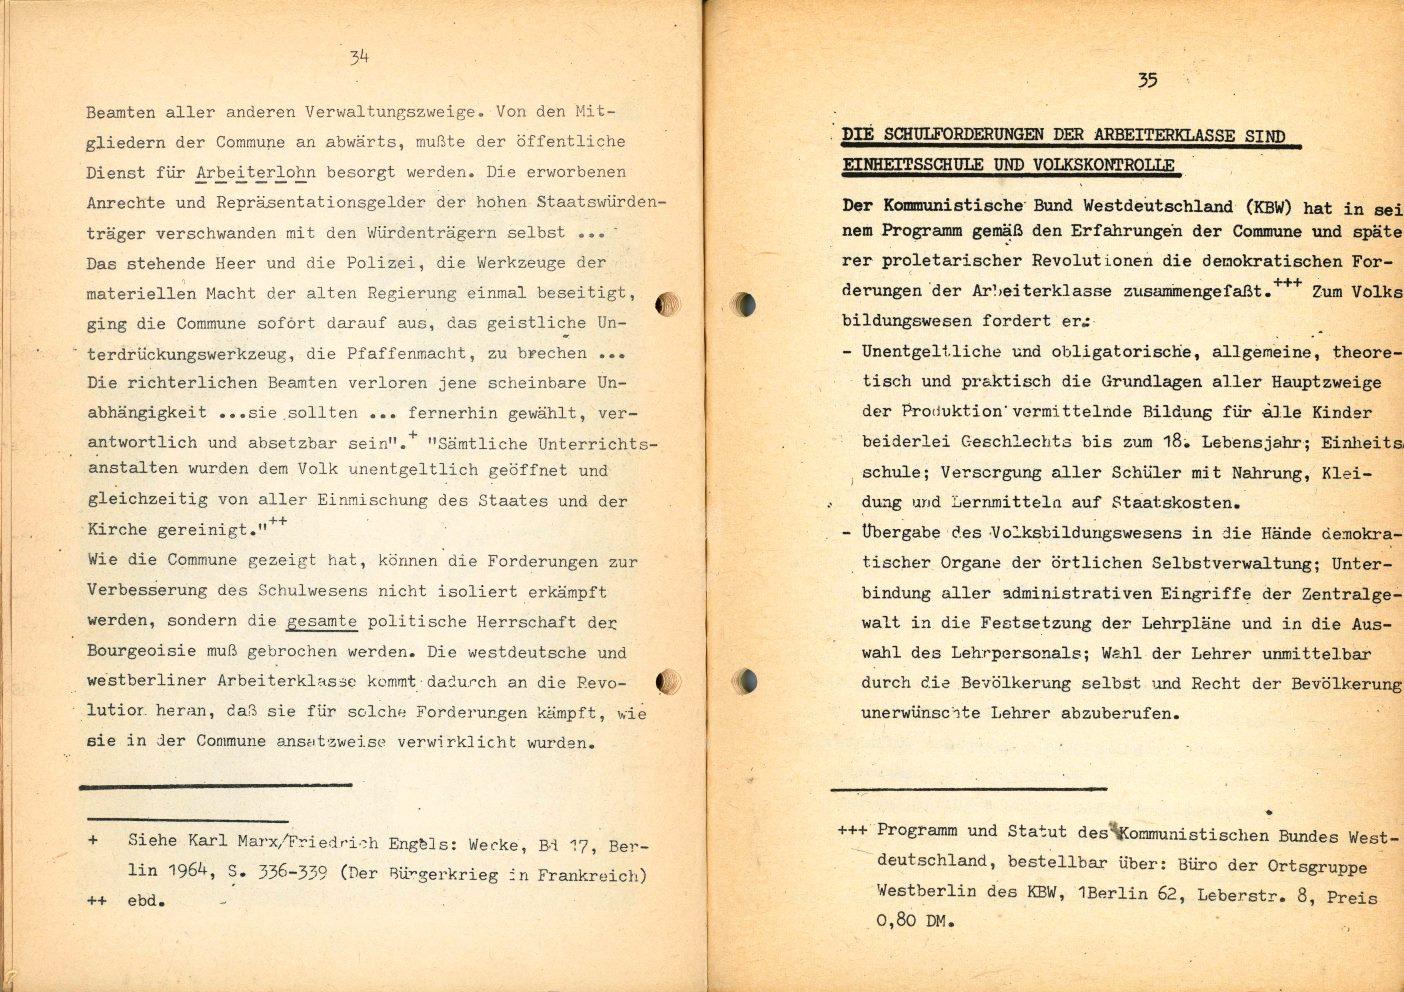 Berlin_SMV_GUV_1974_Schulmisere_20